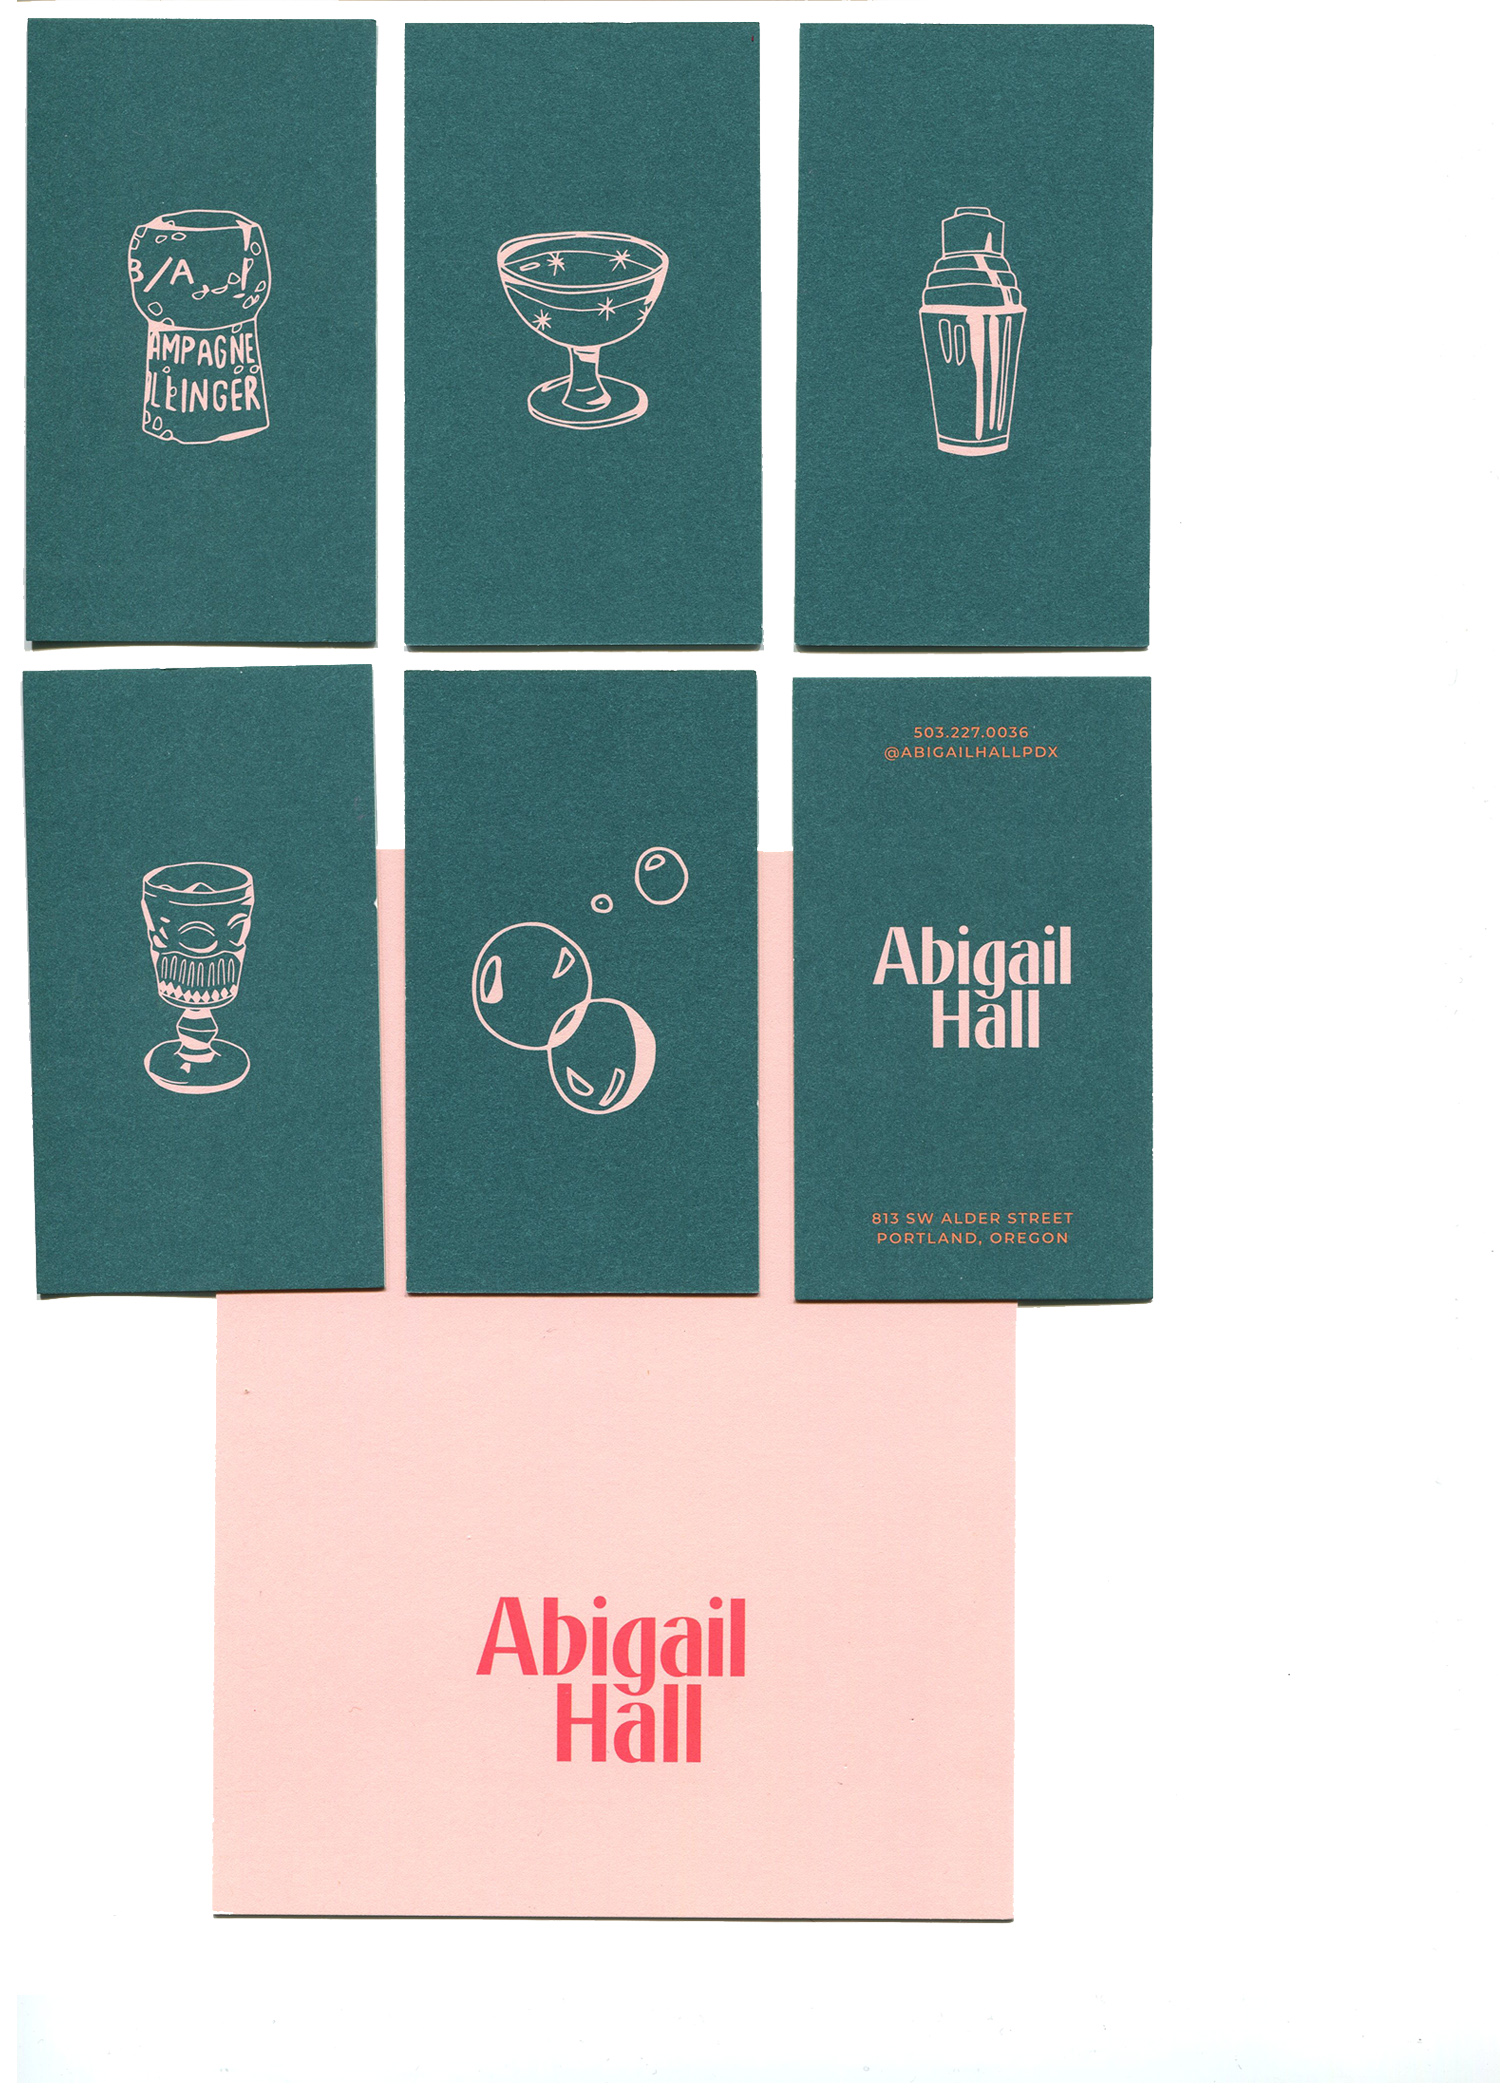 abigail hall product shot 2.jpg